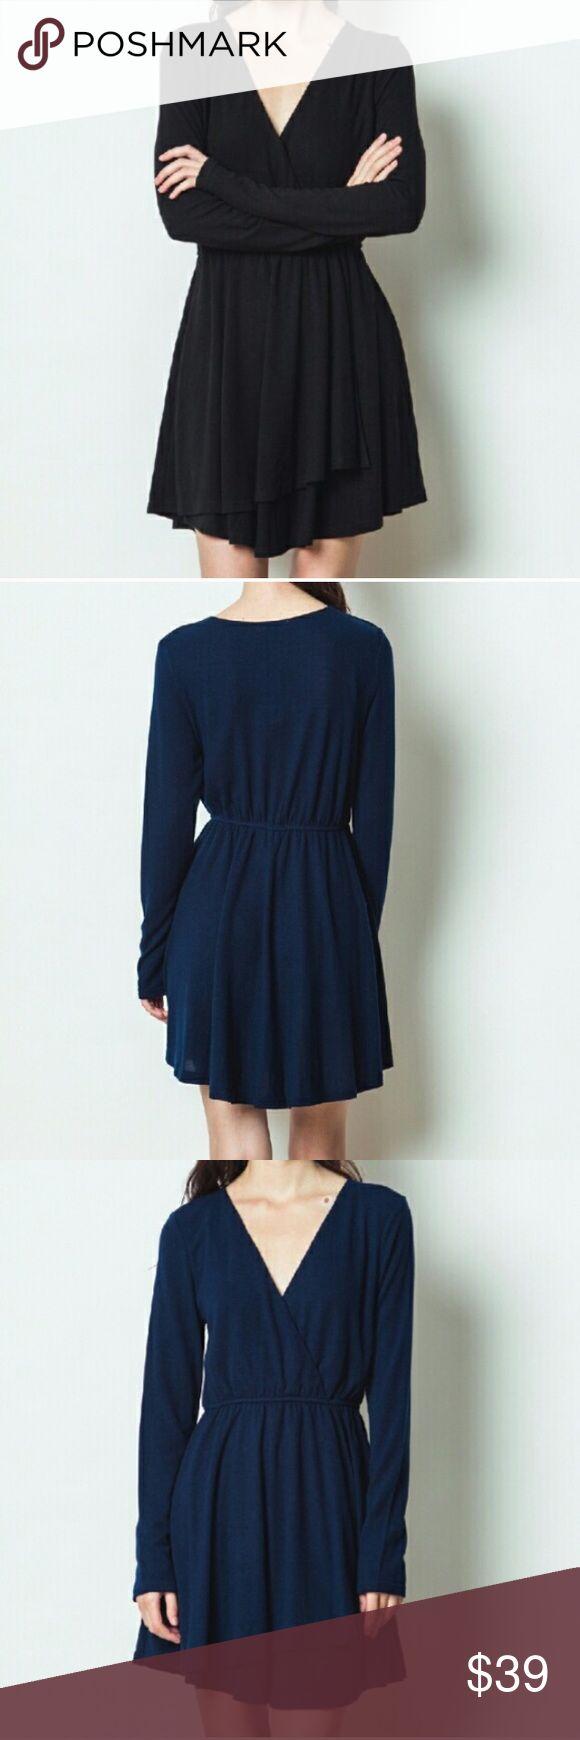 Black wrap dress Long sleeve black knit dress. 100% polyester. Black only. ✨✨✨ Dresses Midi